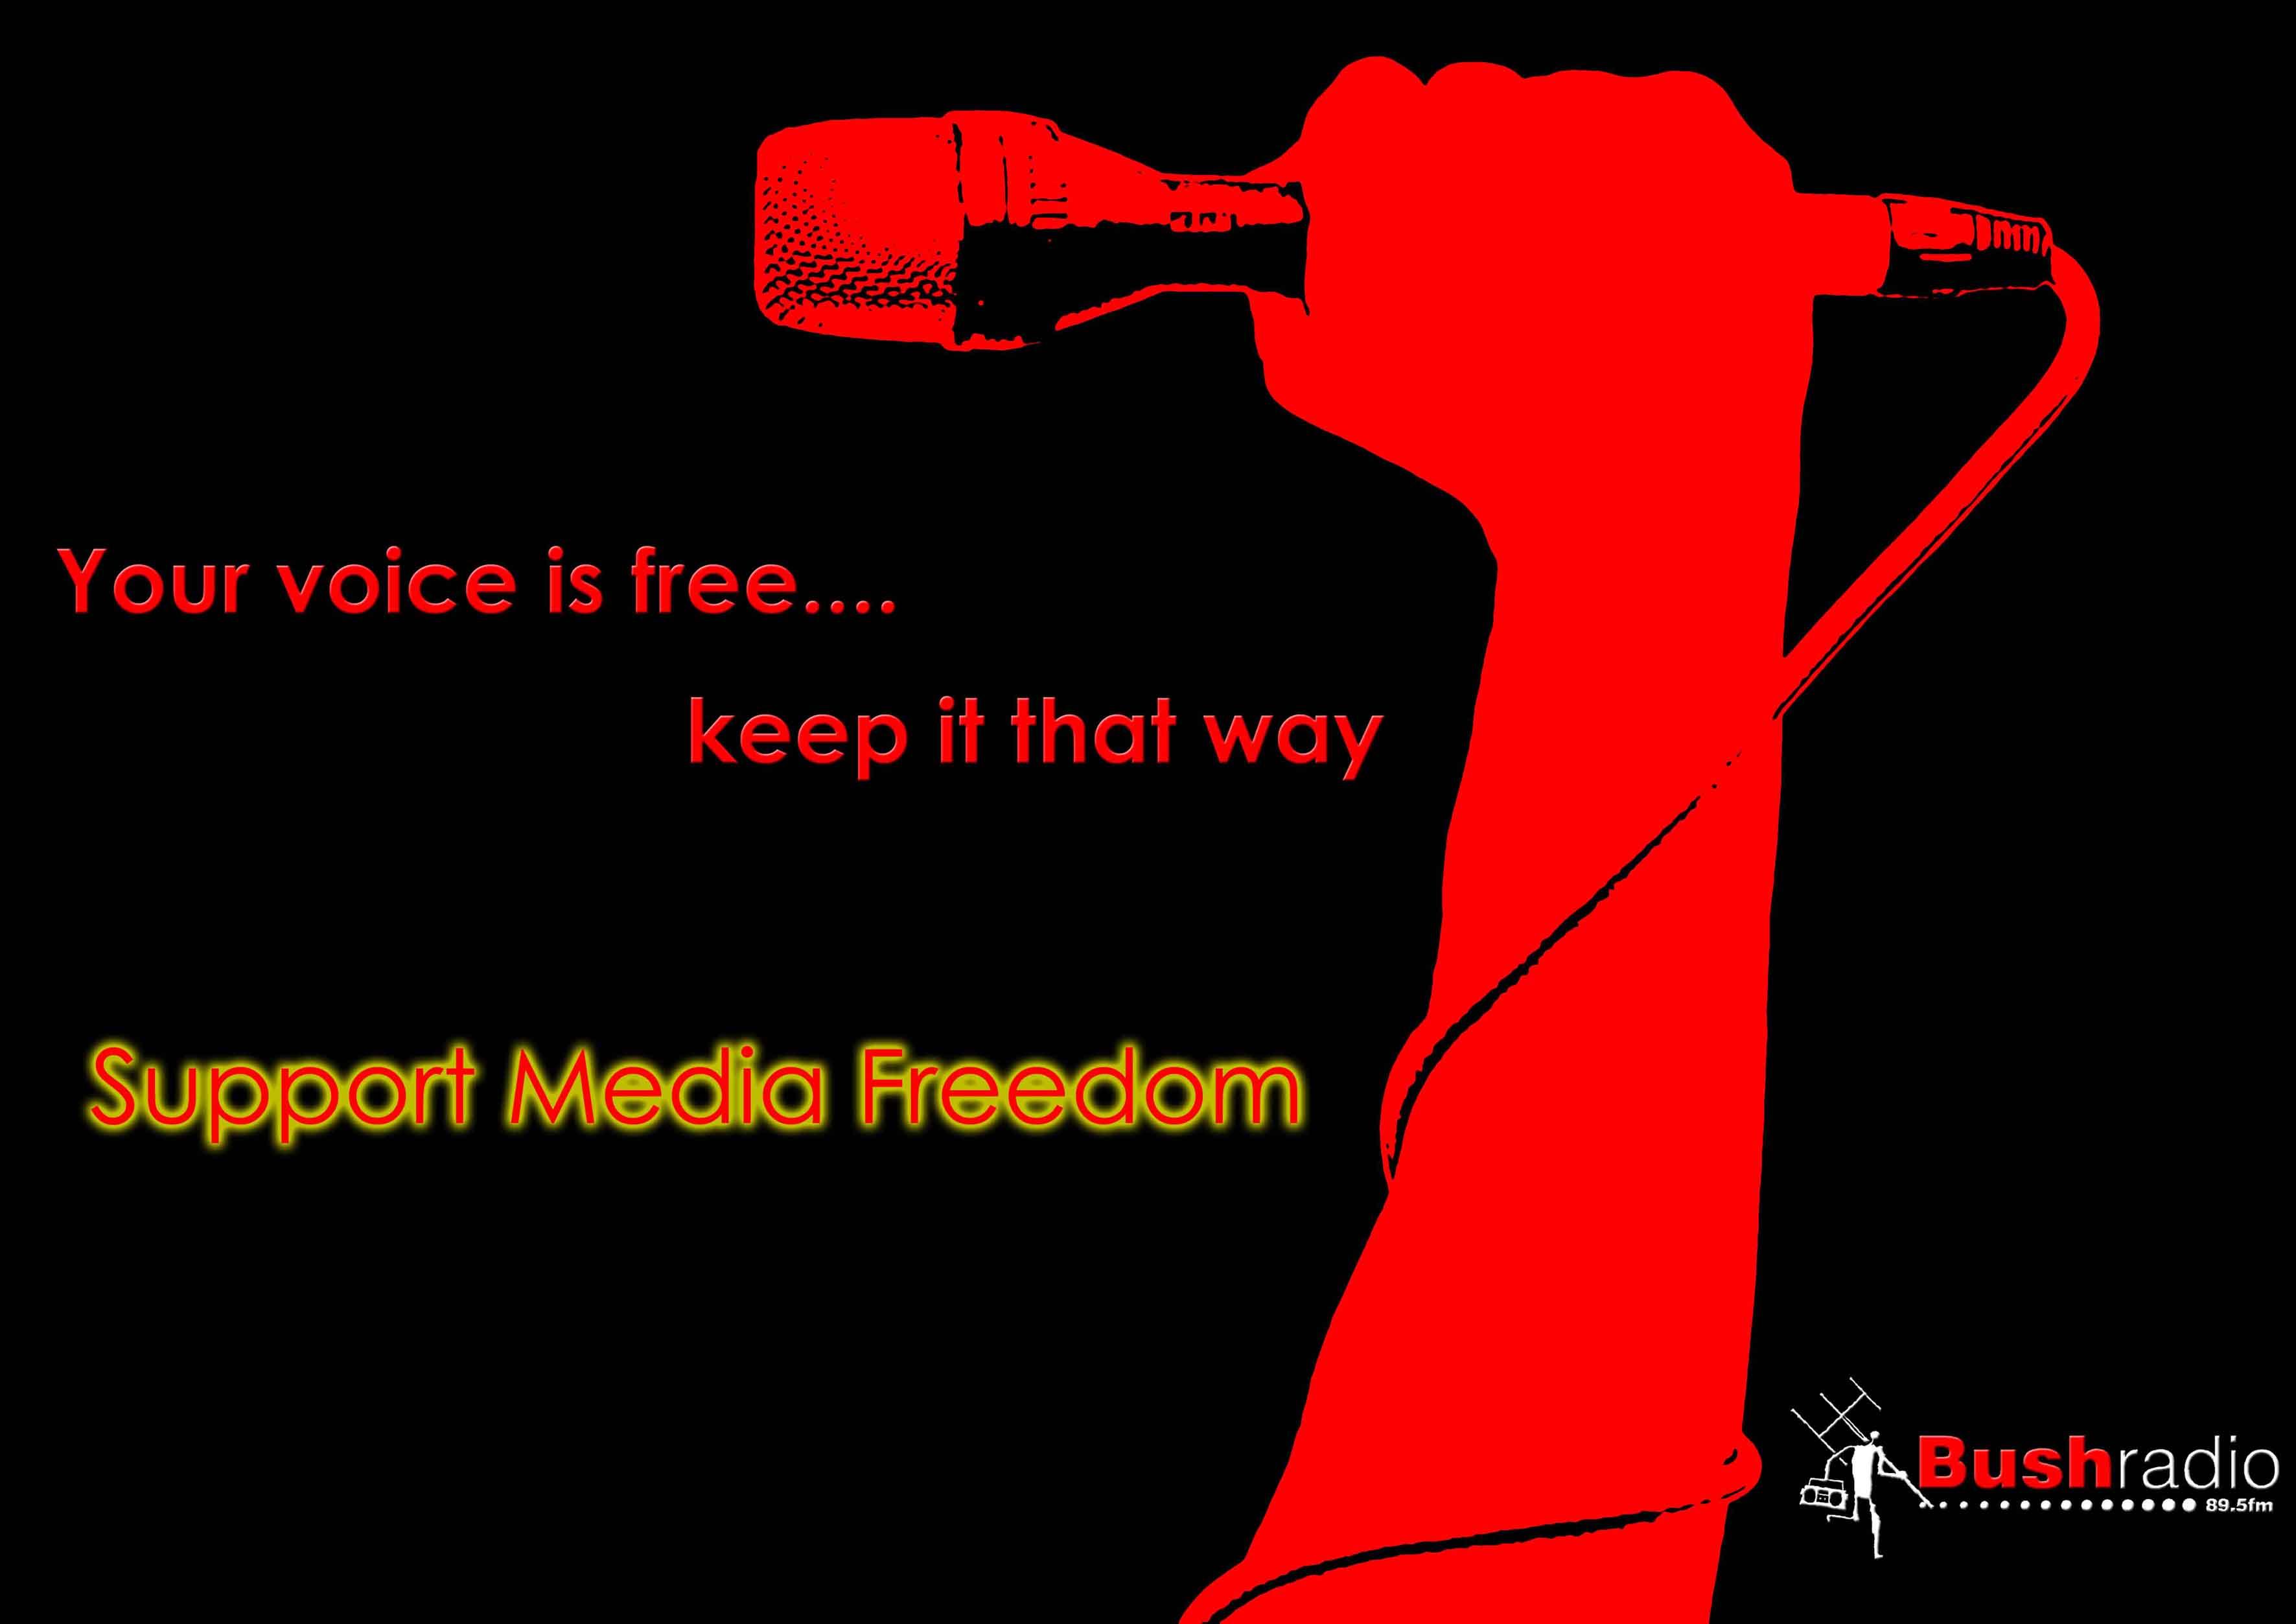 Journalism Bushradio 89 5 Fm